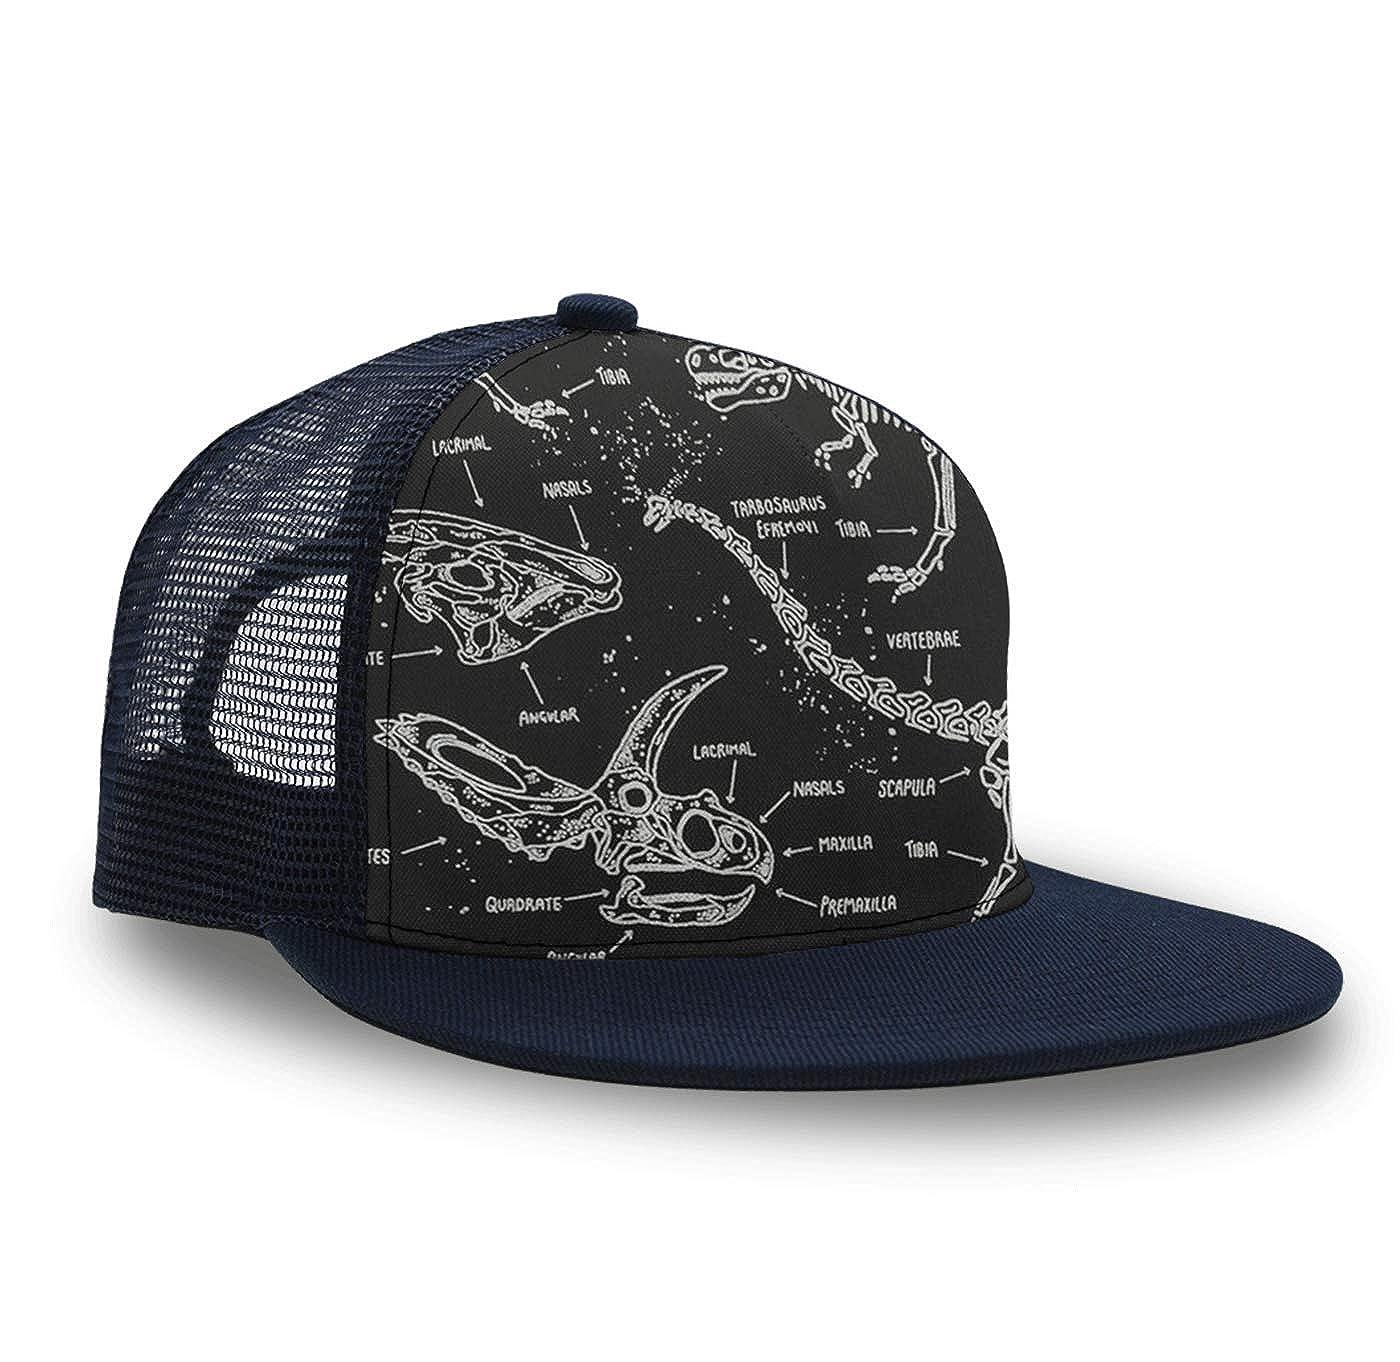 YongColer Plain Baseball Cap Hat Snapback Cap Hip-Pop Trucker Cap for Baseball Team